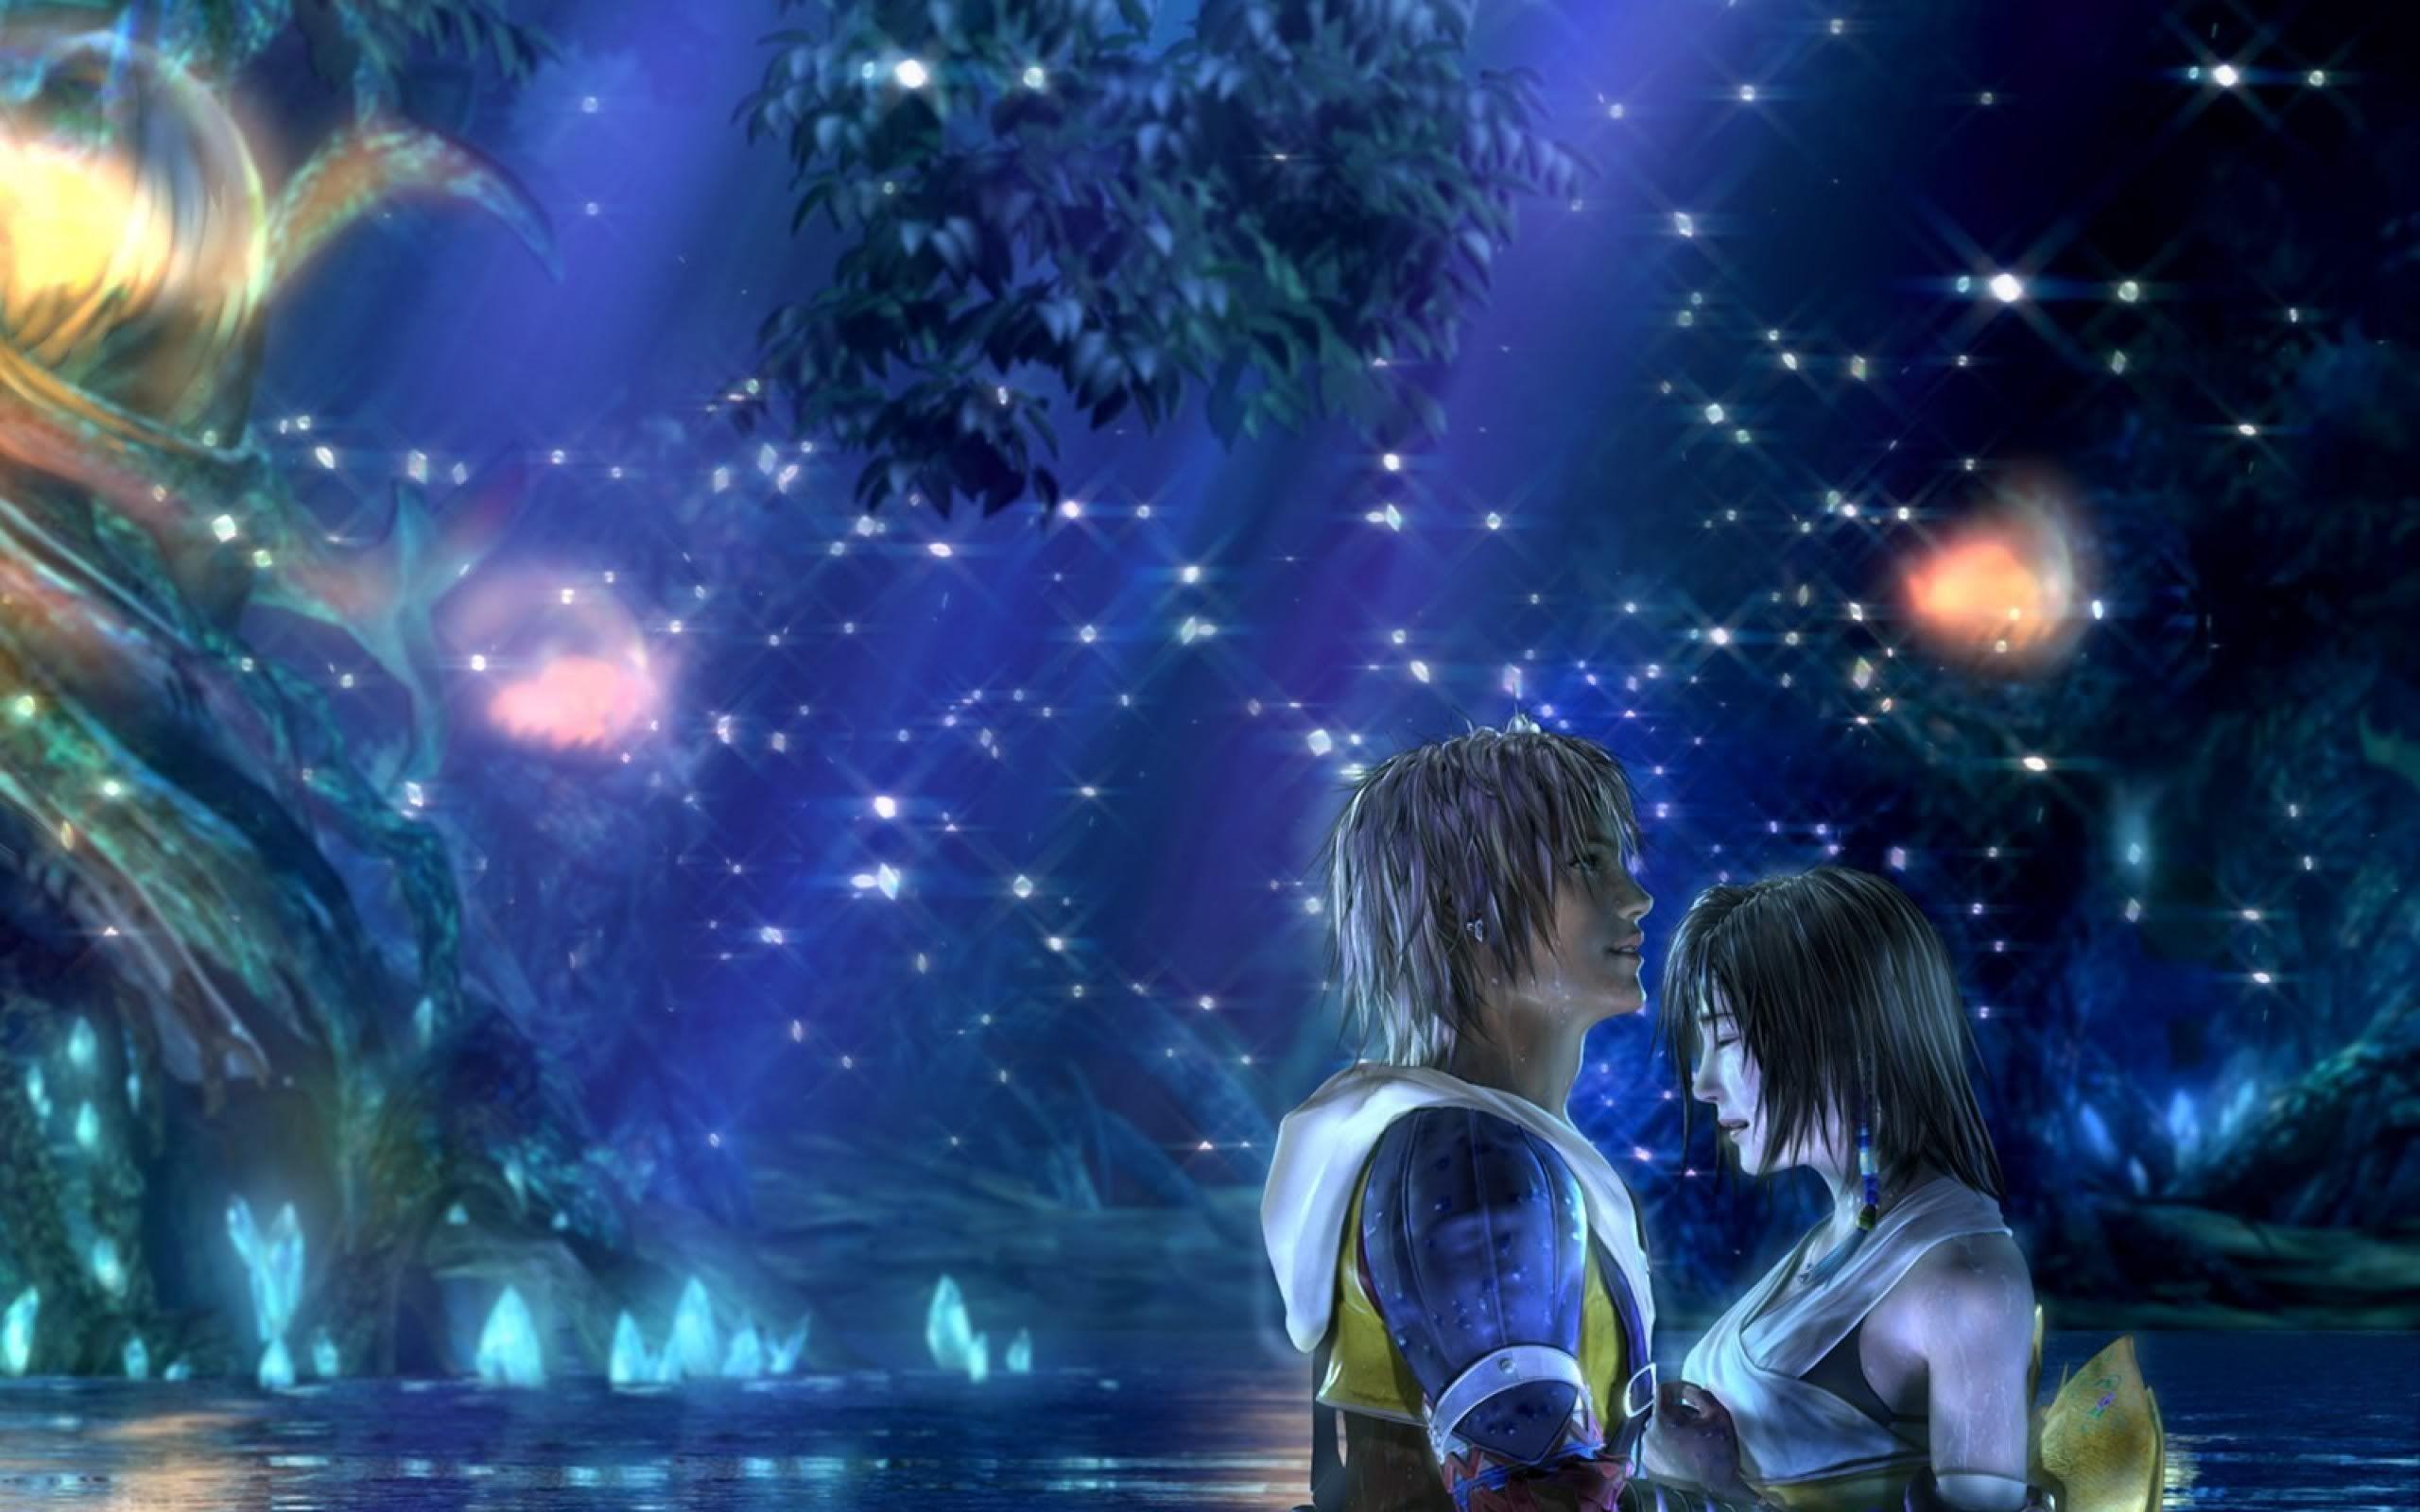 Final Fantasy X Wallpapers – Full HD wallpaper search